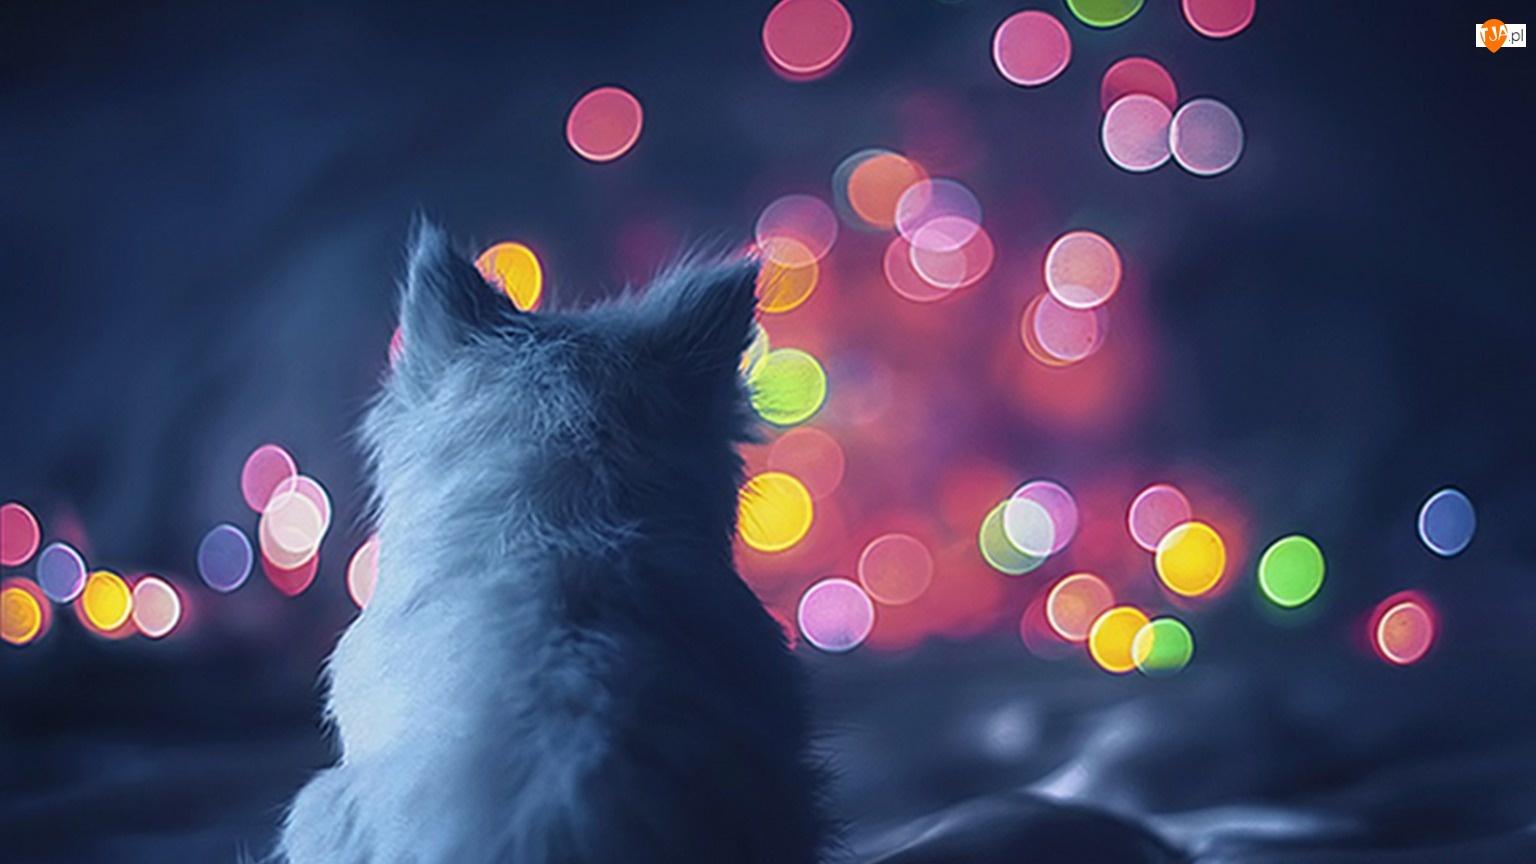 Kule, Kot, Kolorowe